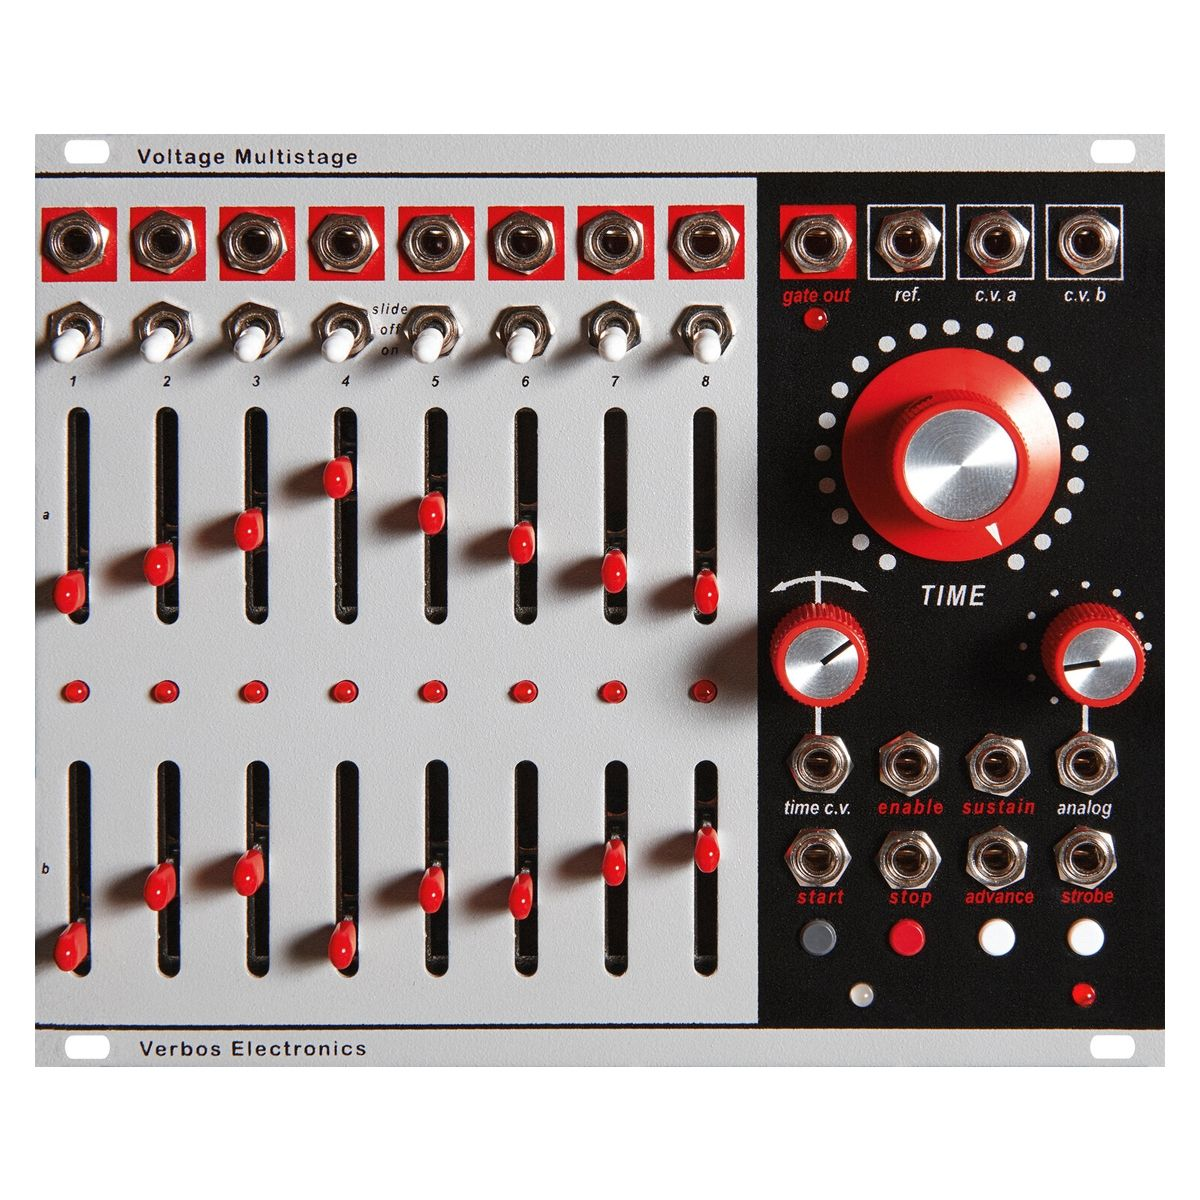 Verbos Electronics Voltage Multistage Eurorack Sequencer Module